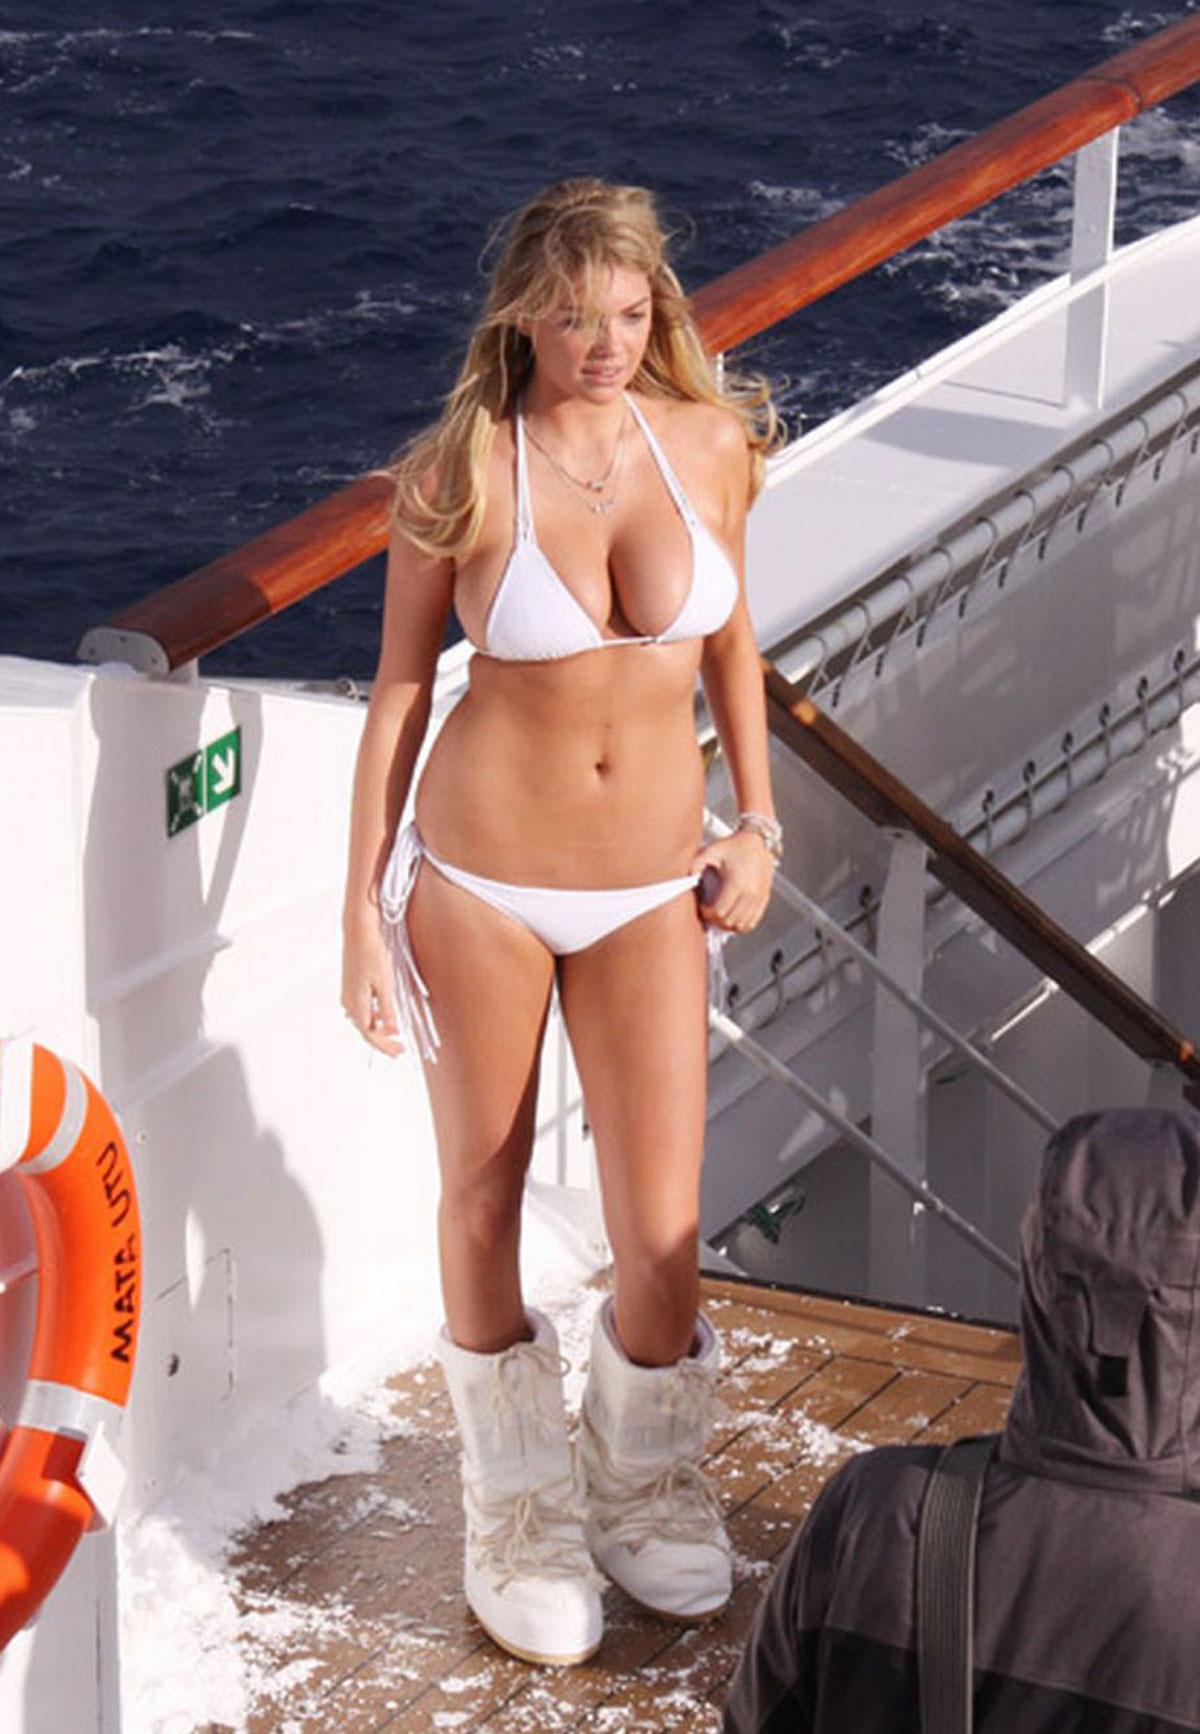 Kate Upton In Bikini Photoshoot For Sports Illustrated